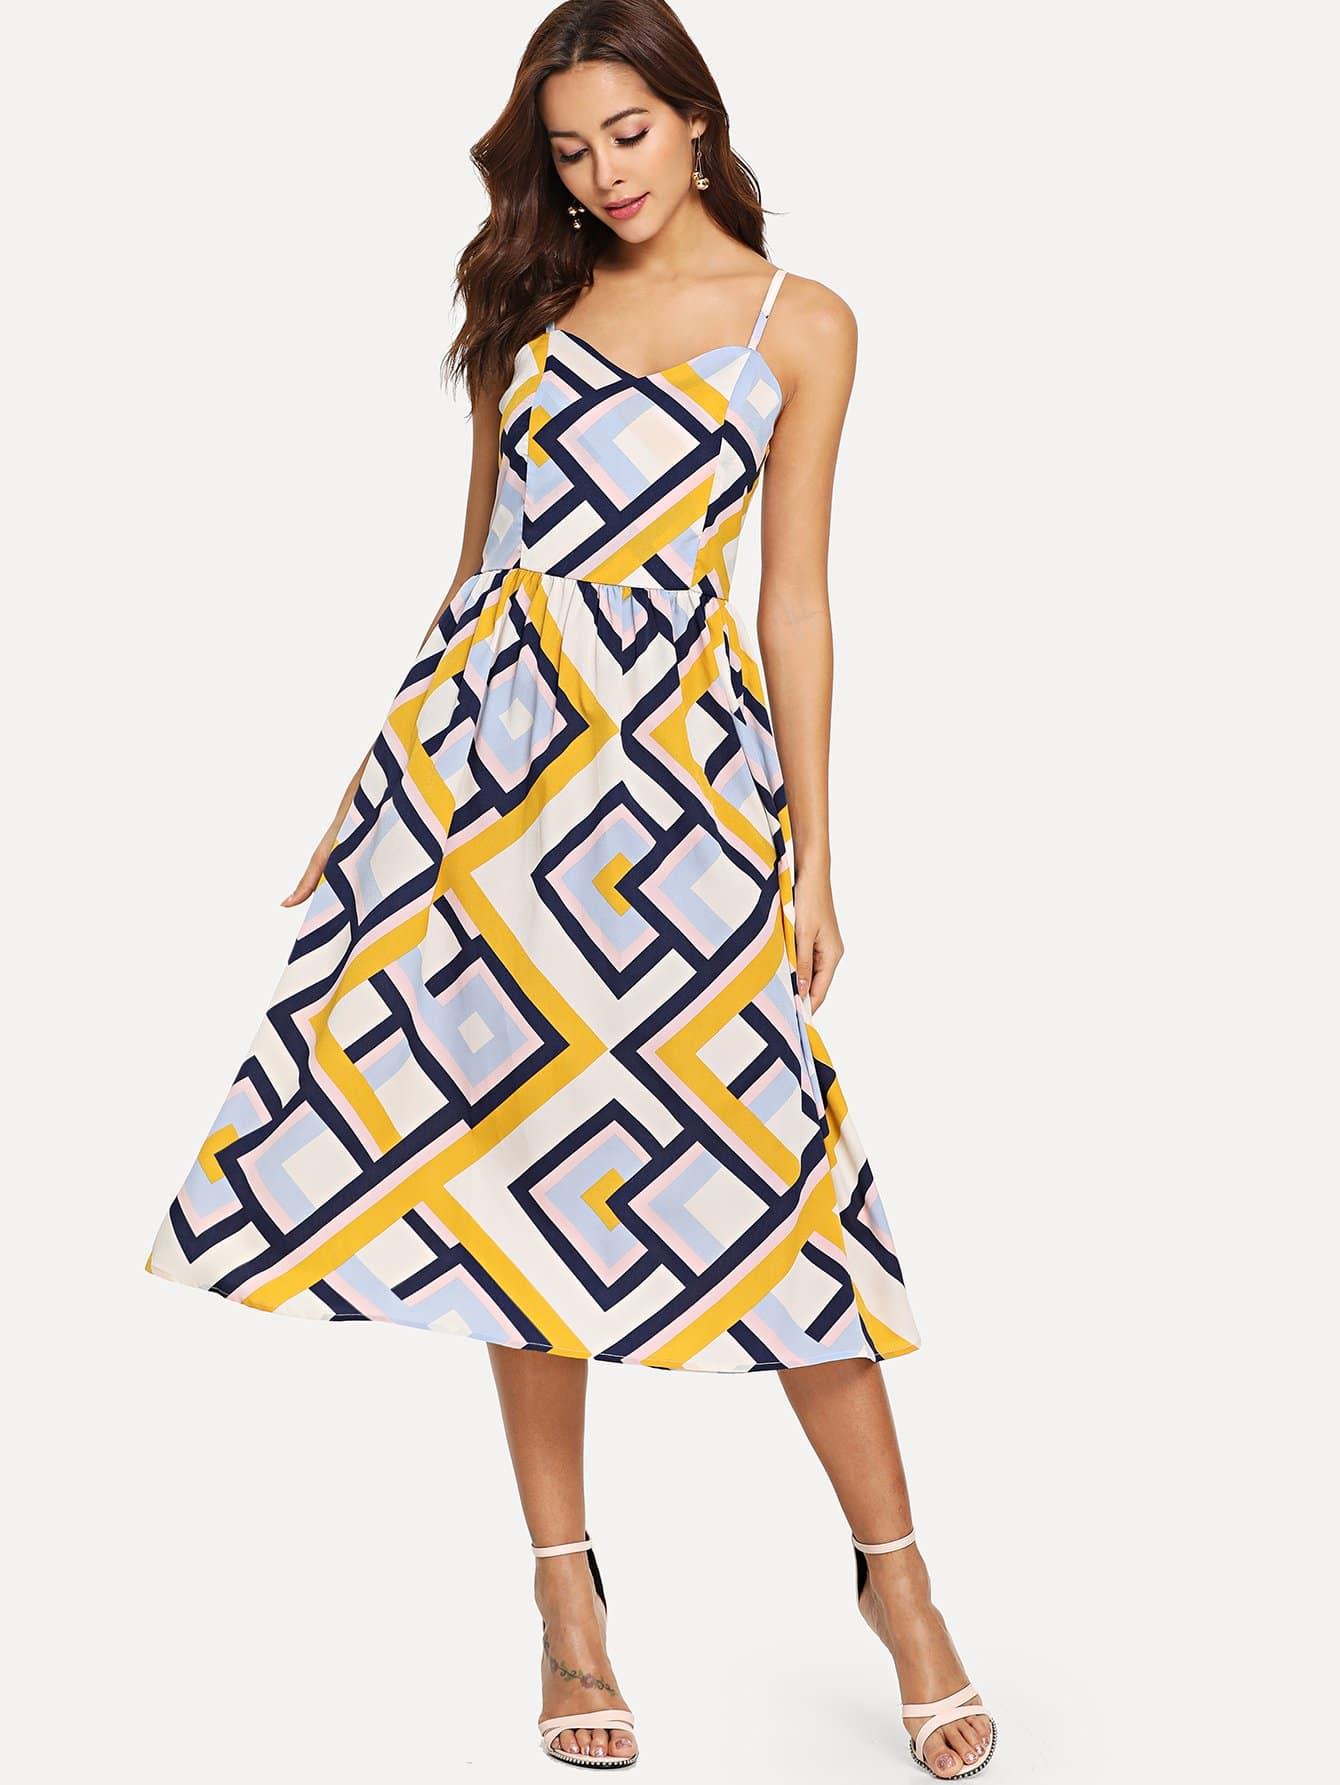 Dresses Shoppr Malaysia Cottonink Floral Harriet Shirt Navy M